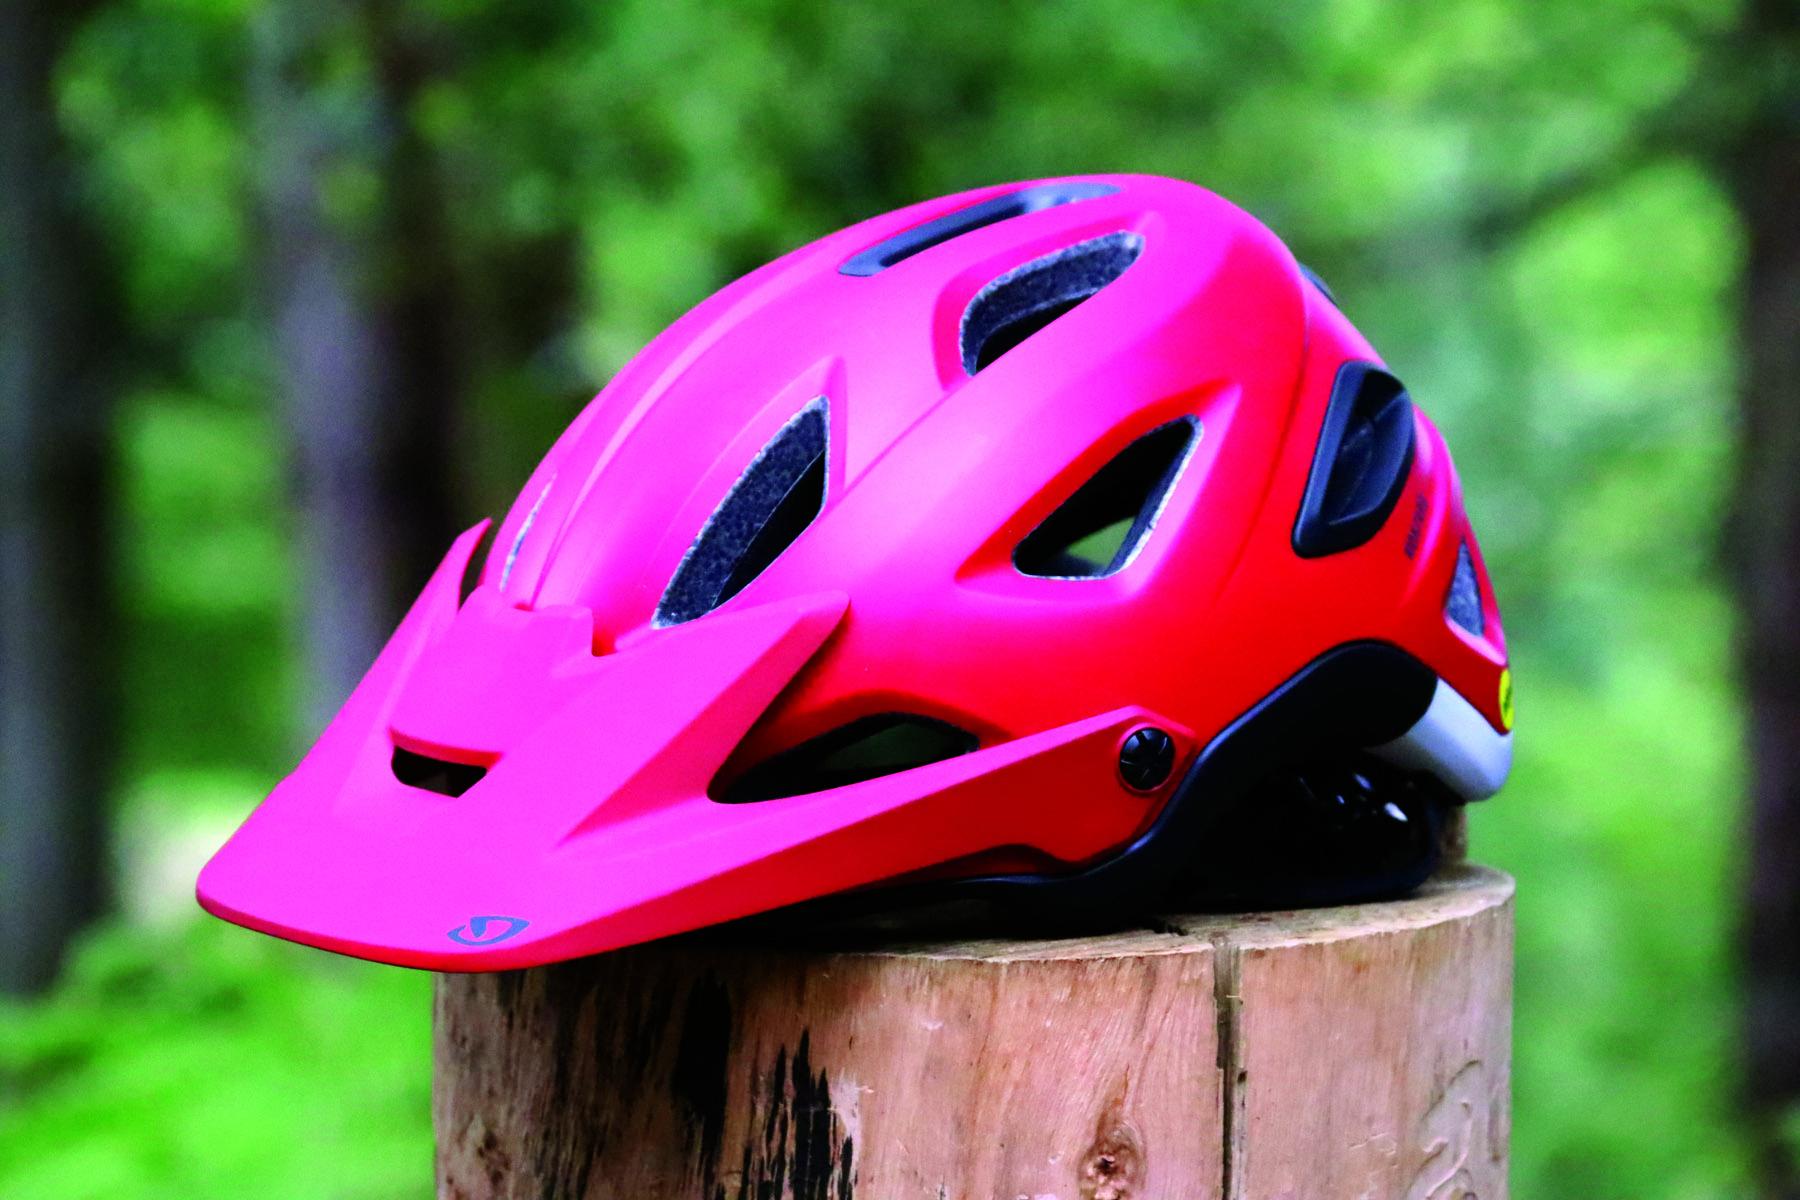 The Giro Montaro